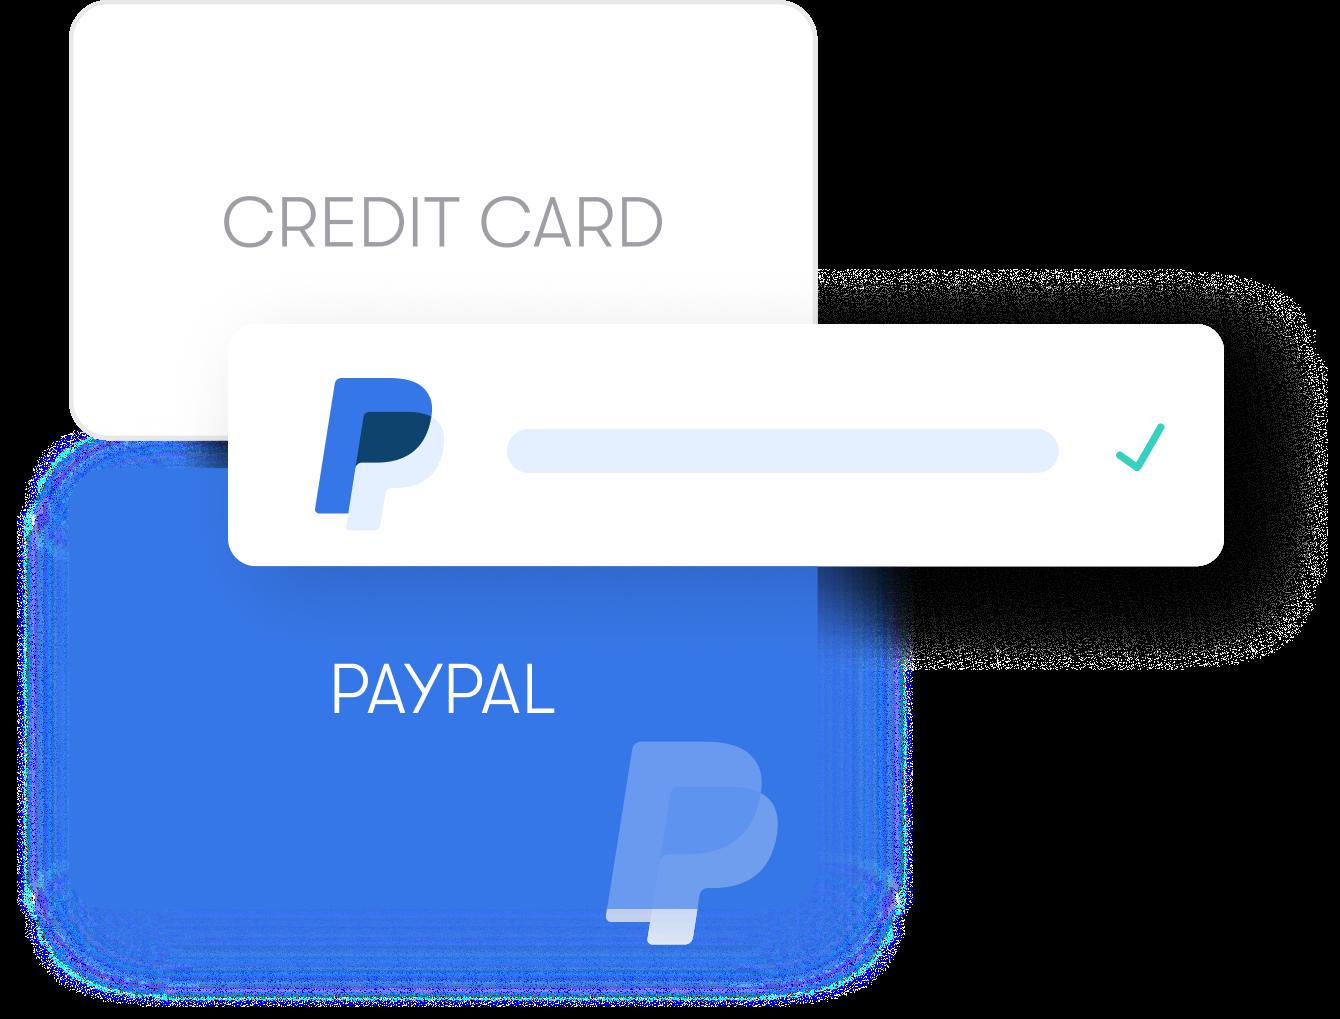 Payments & cards management